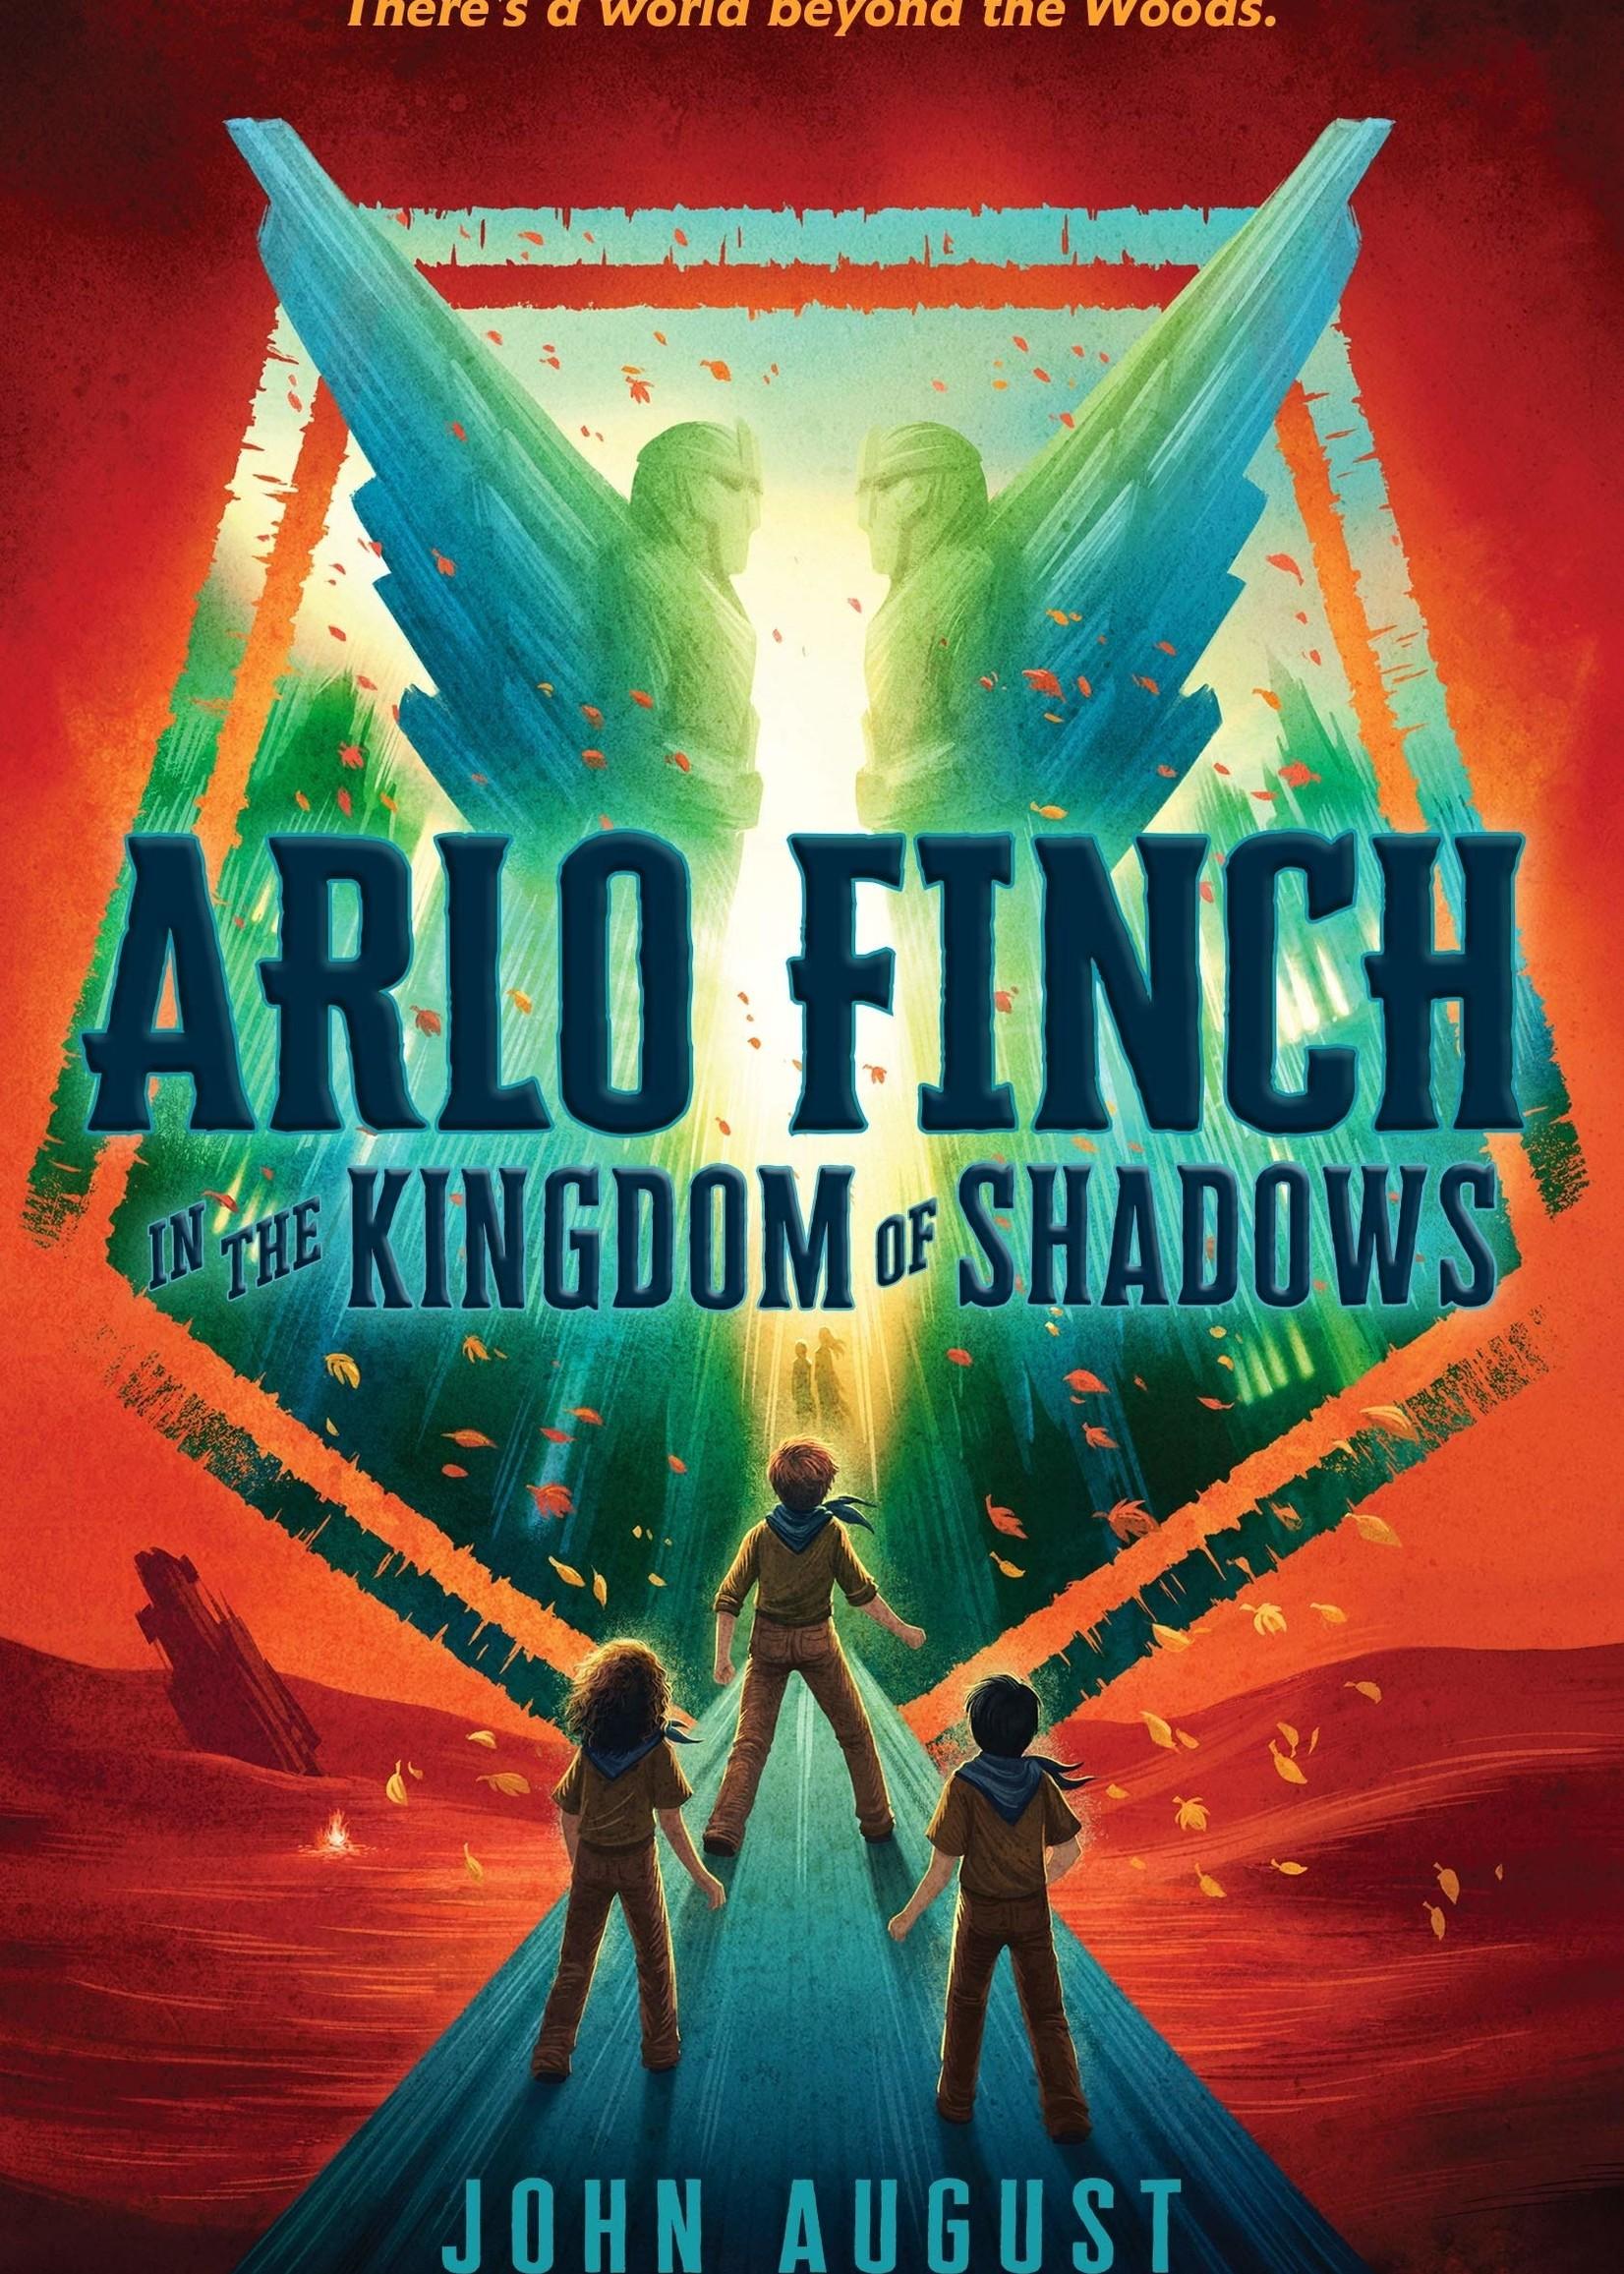 Arlo Finch #03, Arlo Finch in the Kingdom of Shadows - Paperback